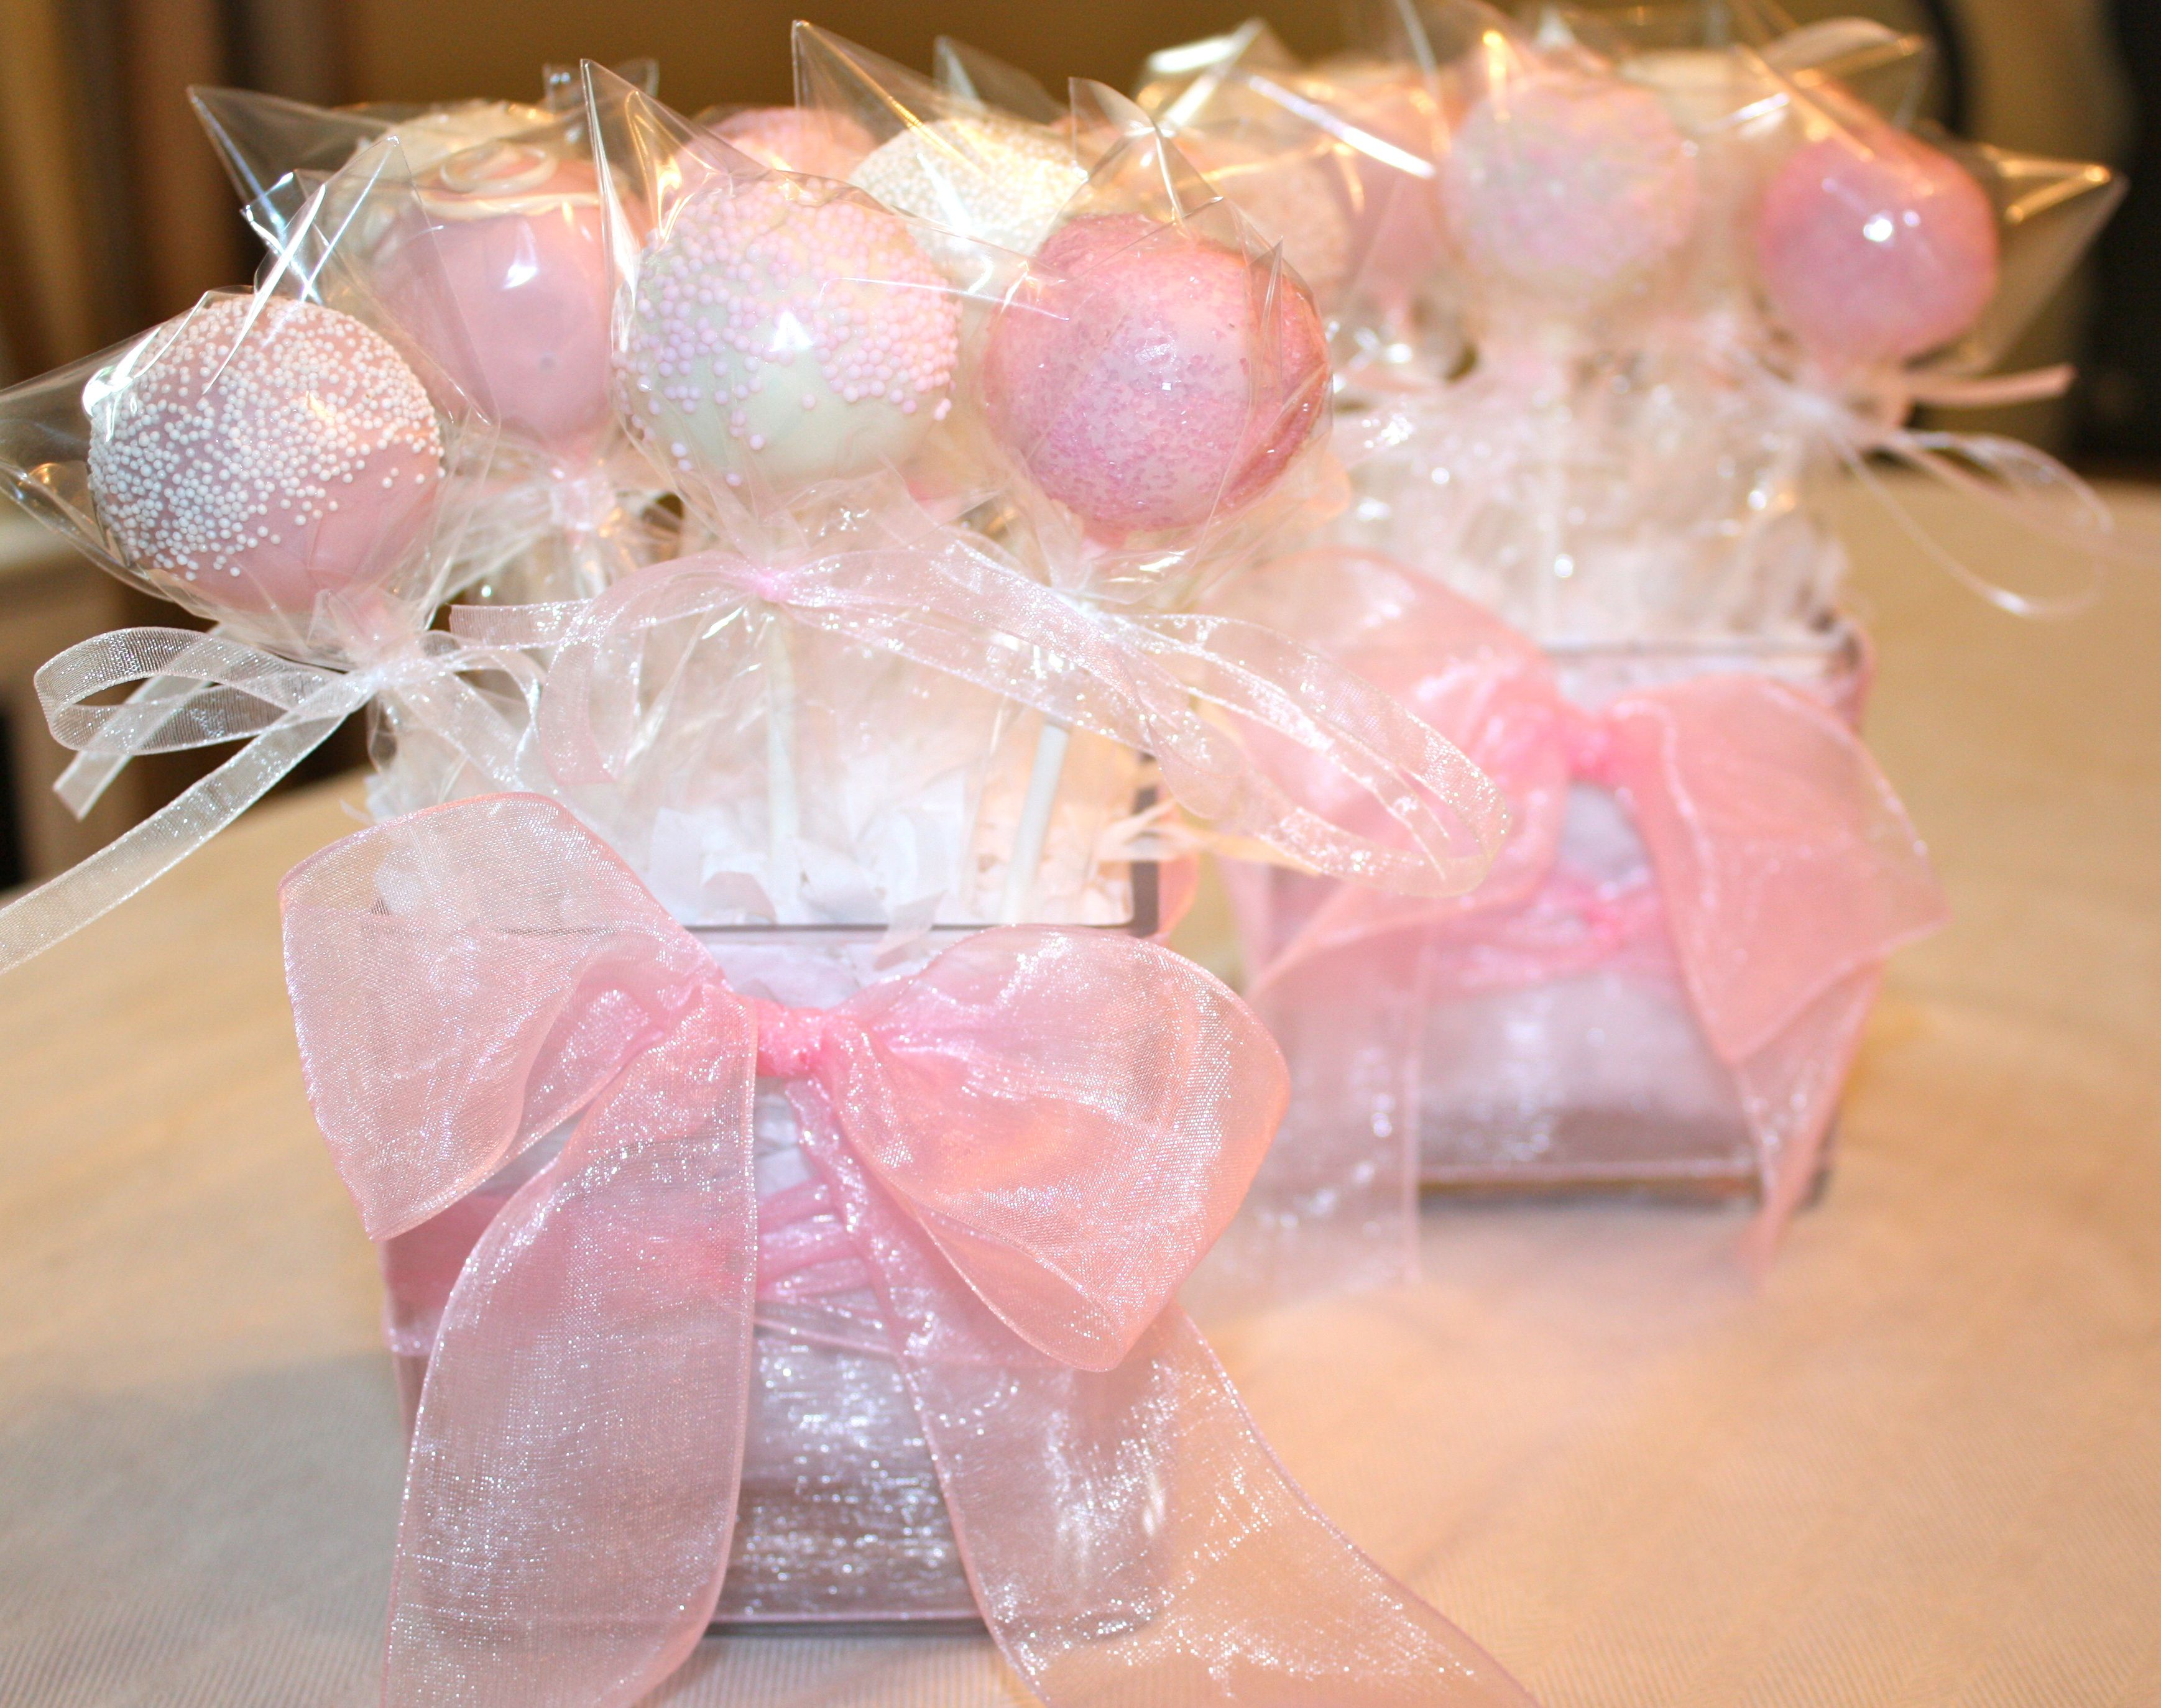 Cake Pop Centerpieces For Baptism : cake pop centerpieces - Google Search Cake Pops ...